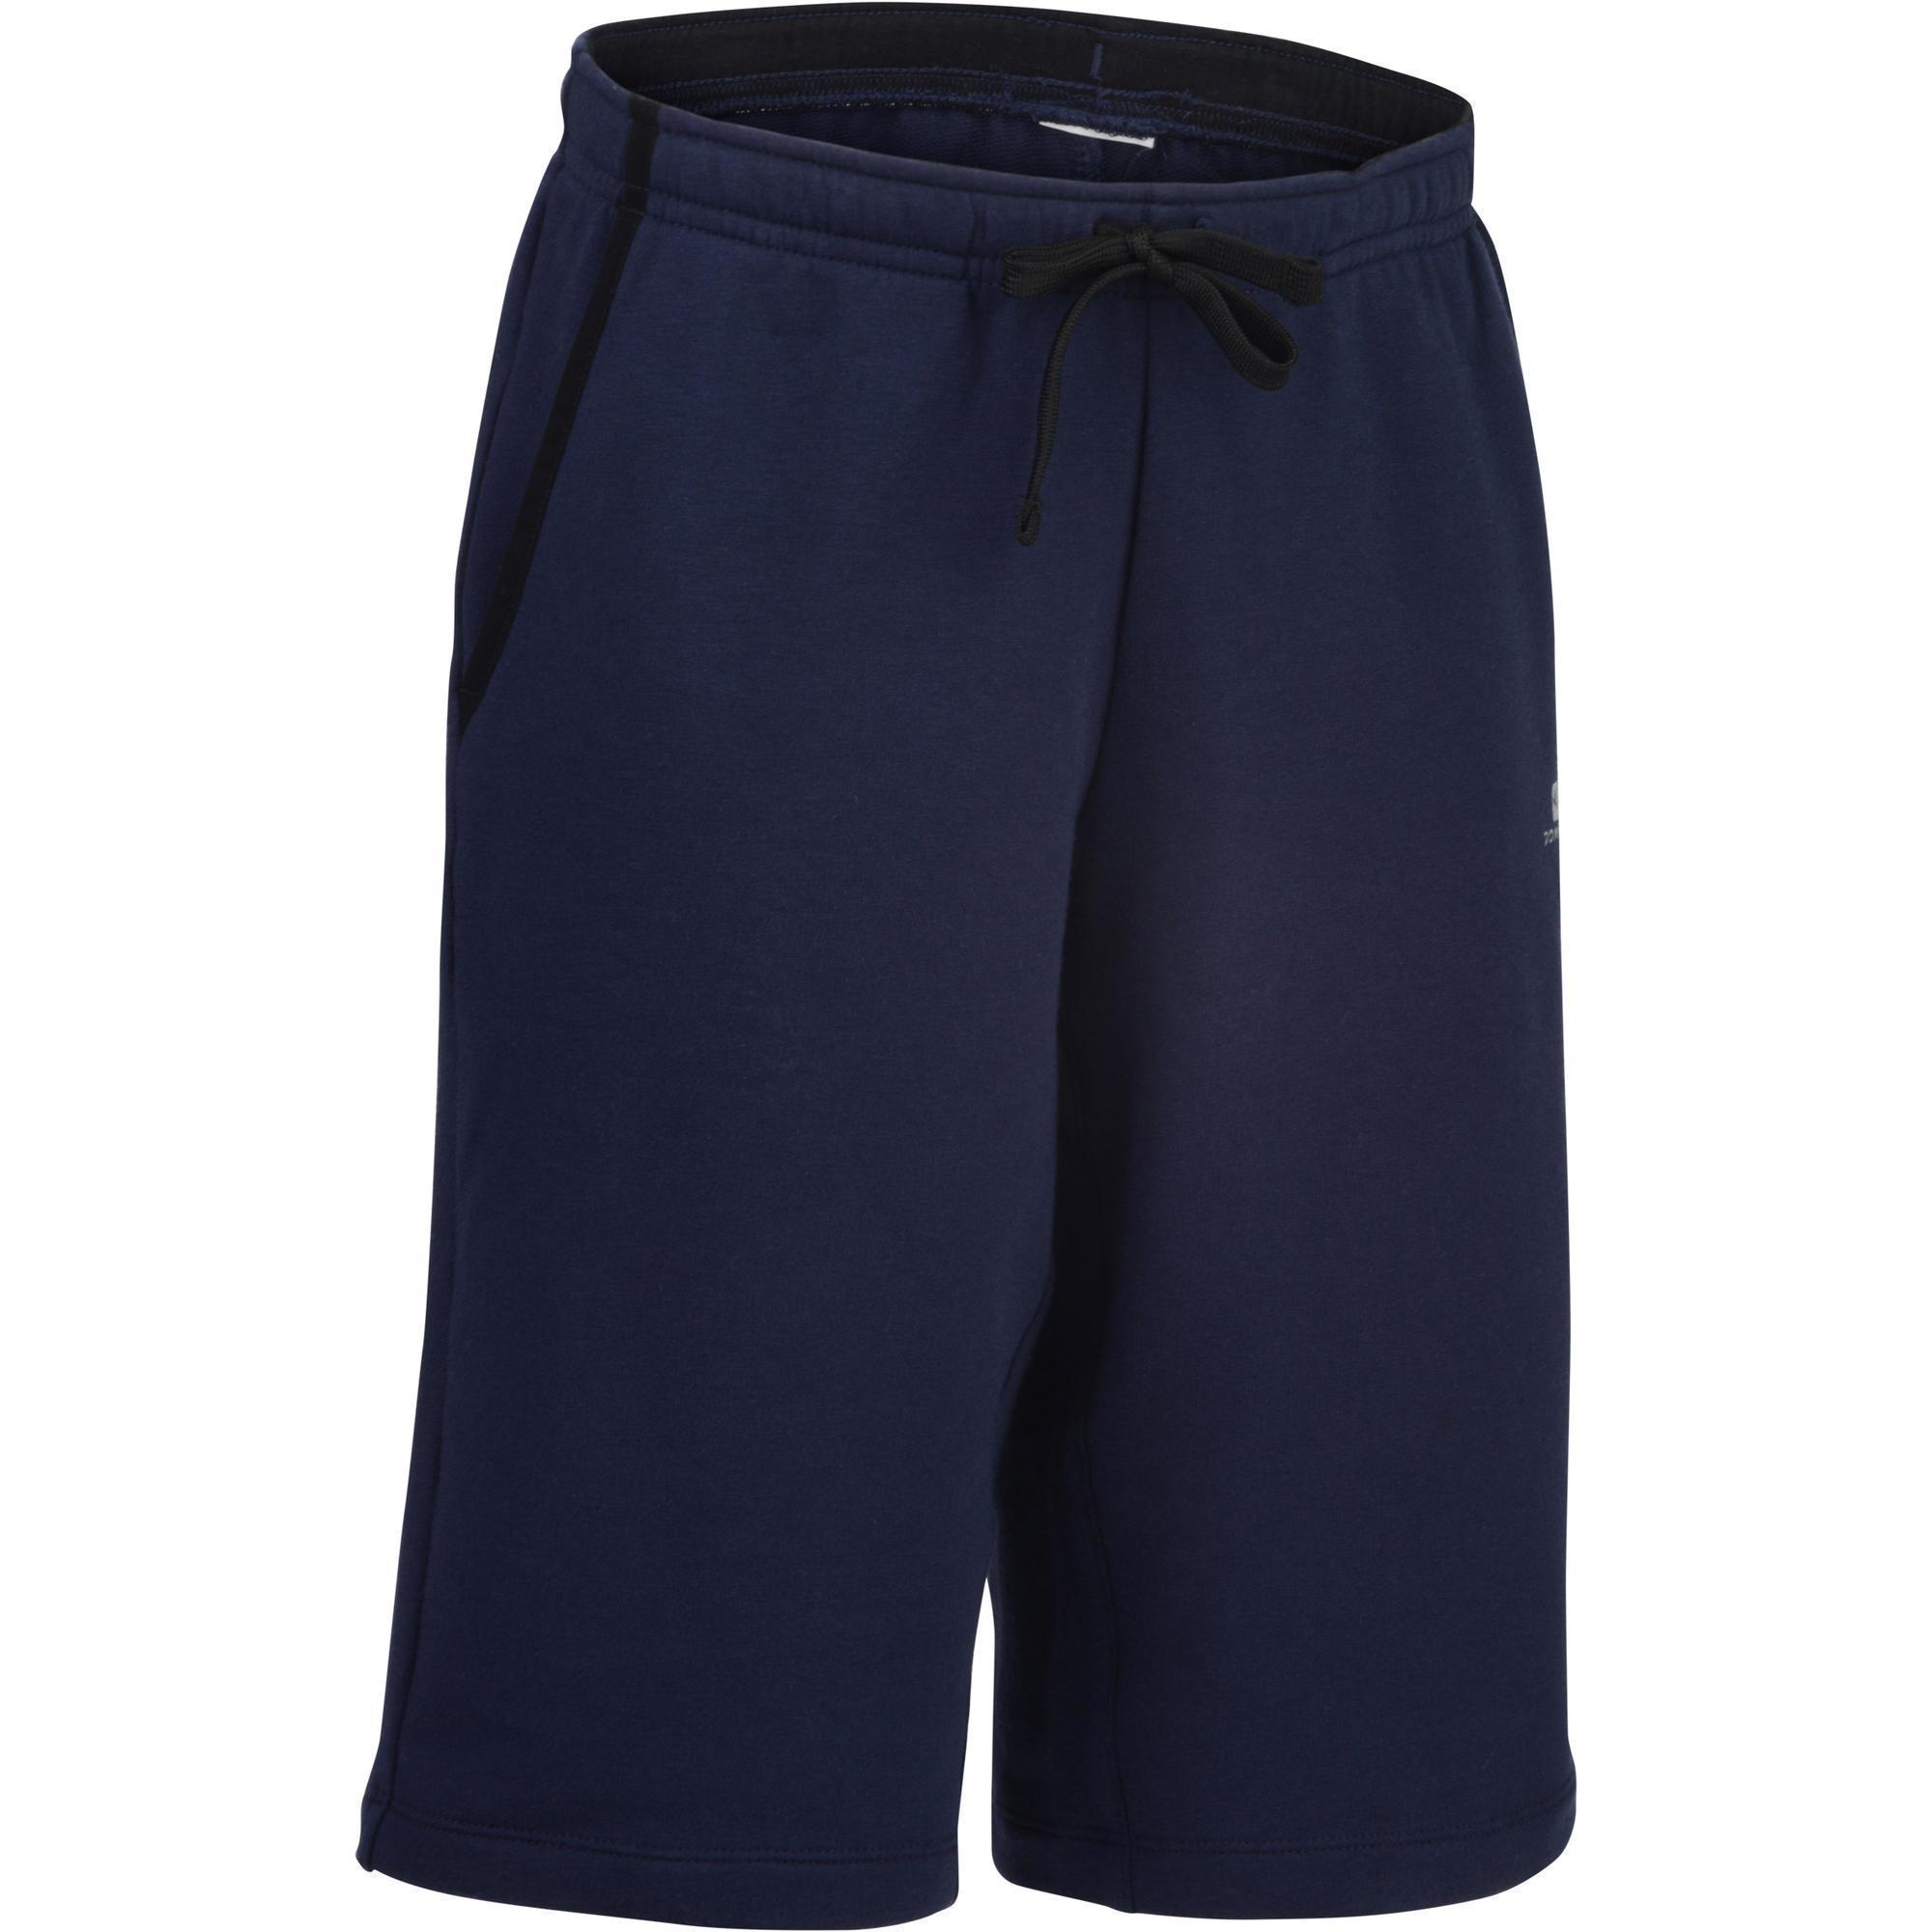 fd2bbf95b Vêtements enfant - Short 500 Gym Garçon poches marine